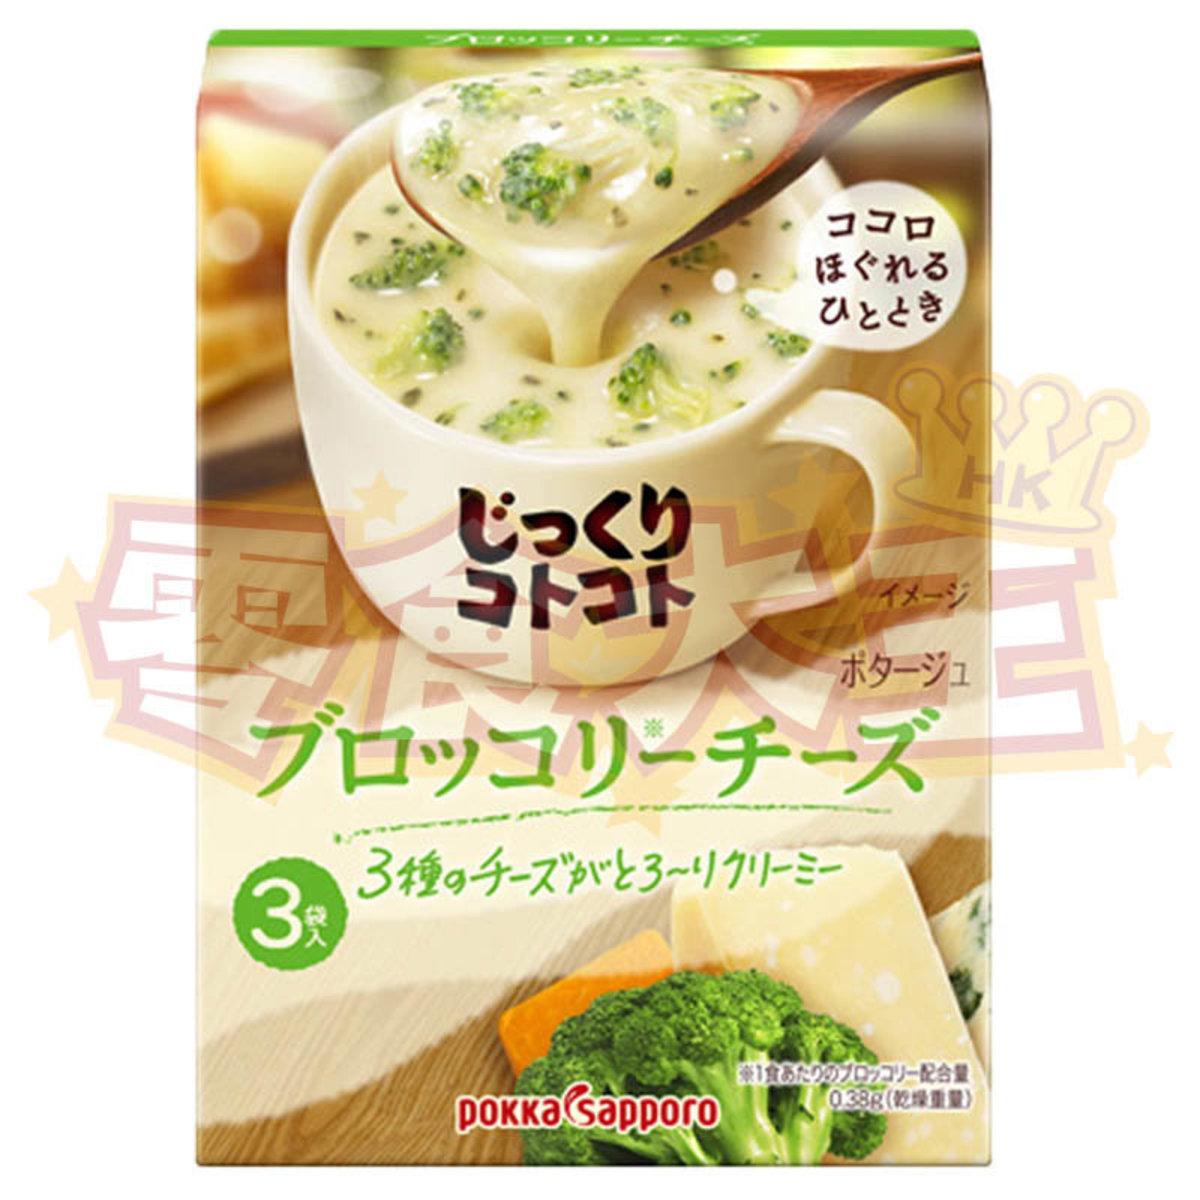 Broccoli cheese potage -57g  (4589850823084)